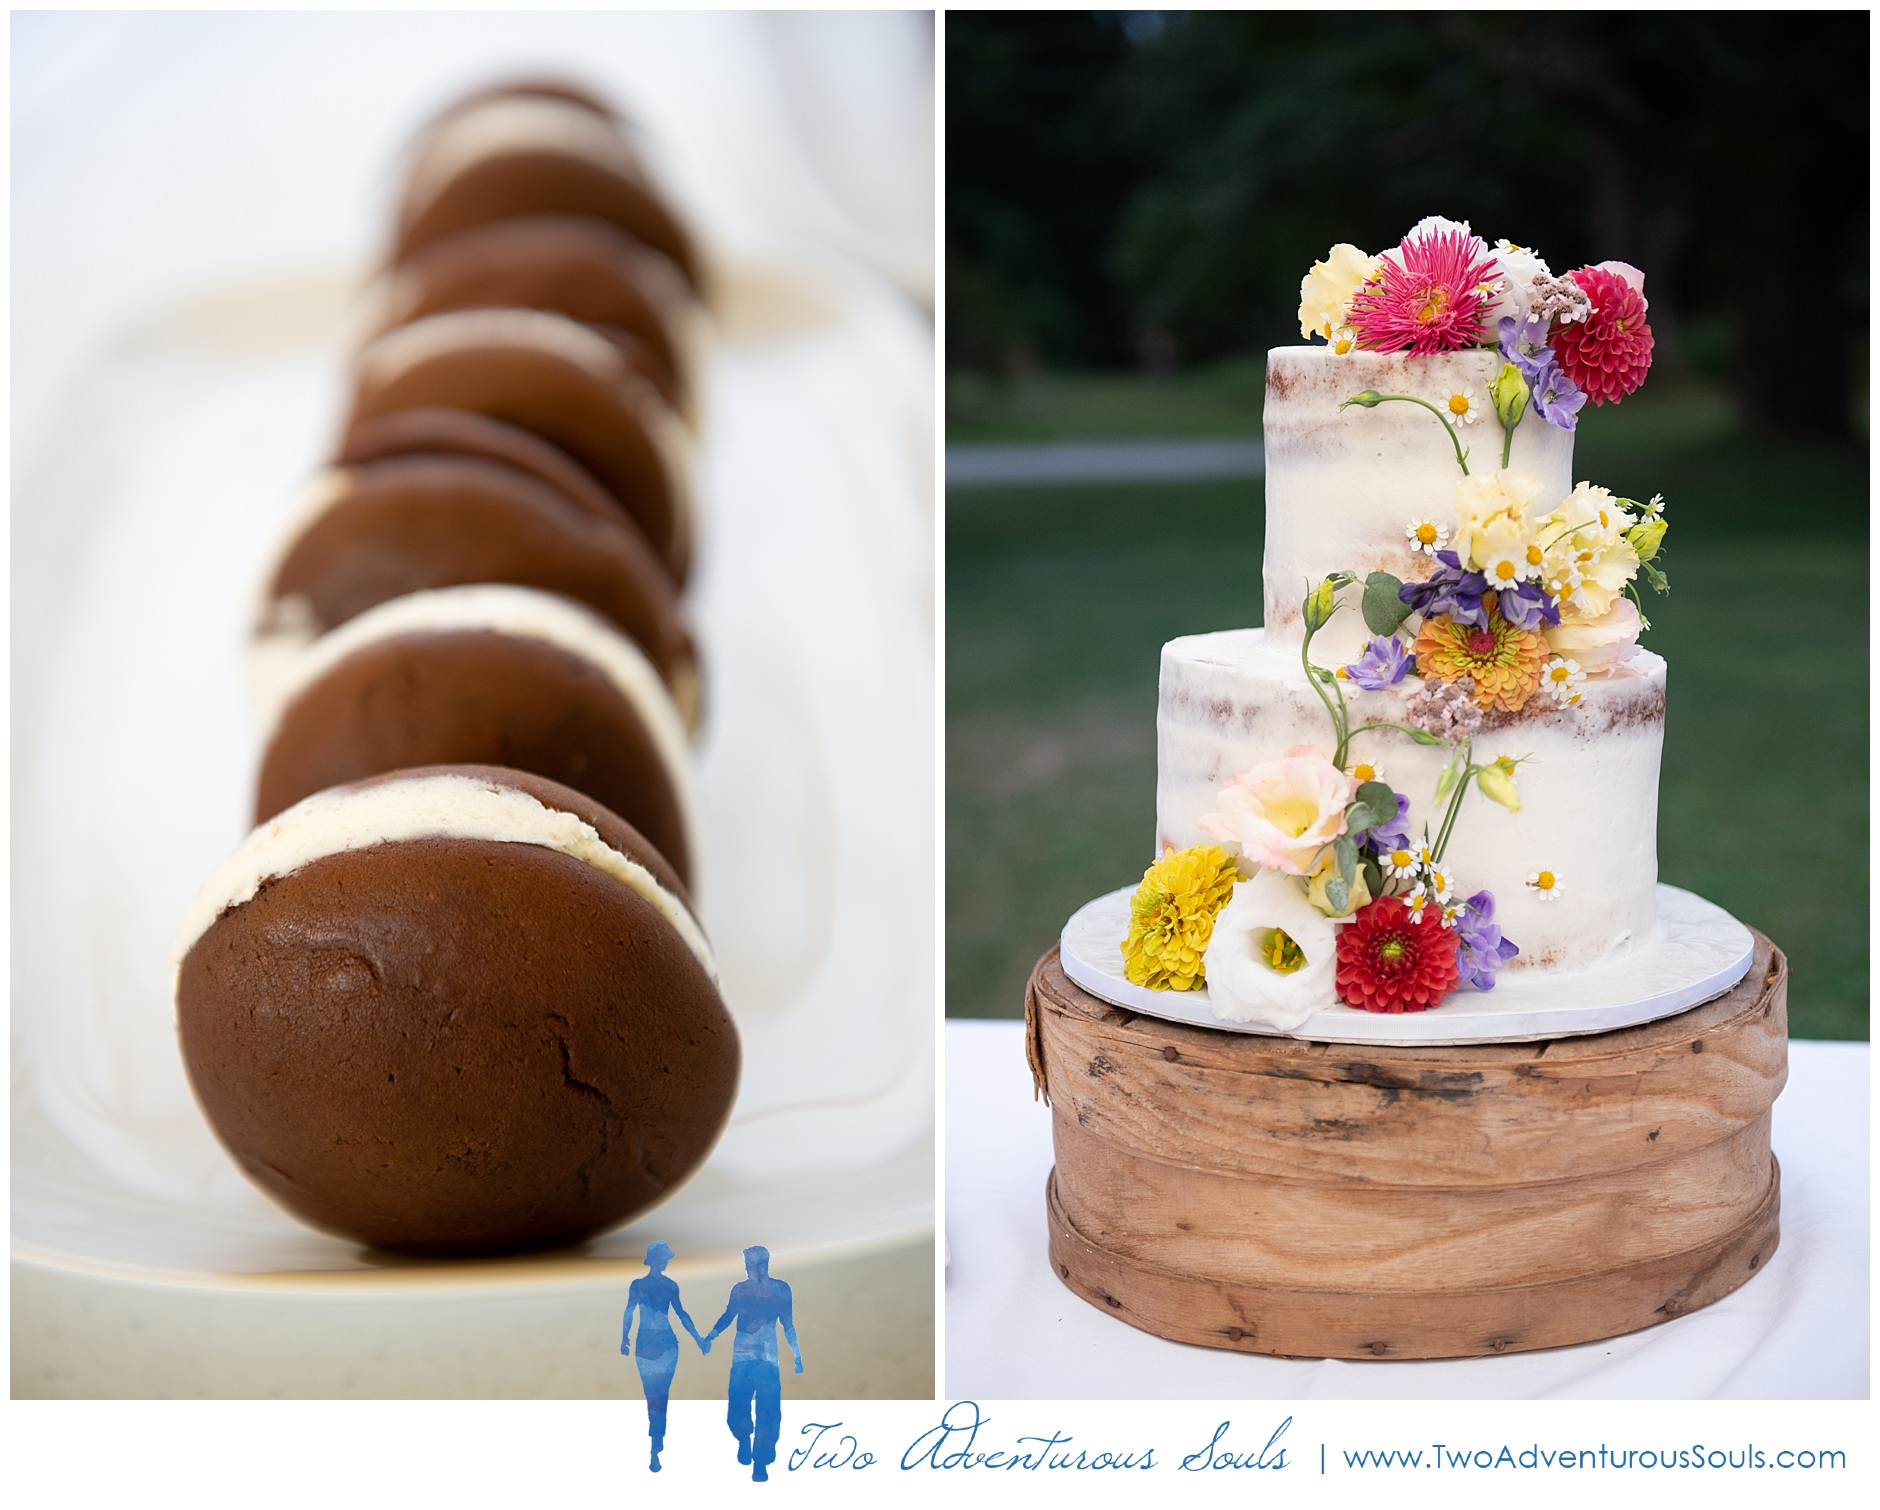 Chebeague Island Inn Wedding Photograpehrs, Maine Wedding Photographers, Two Adventurous Souls-082419_0014.jpg